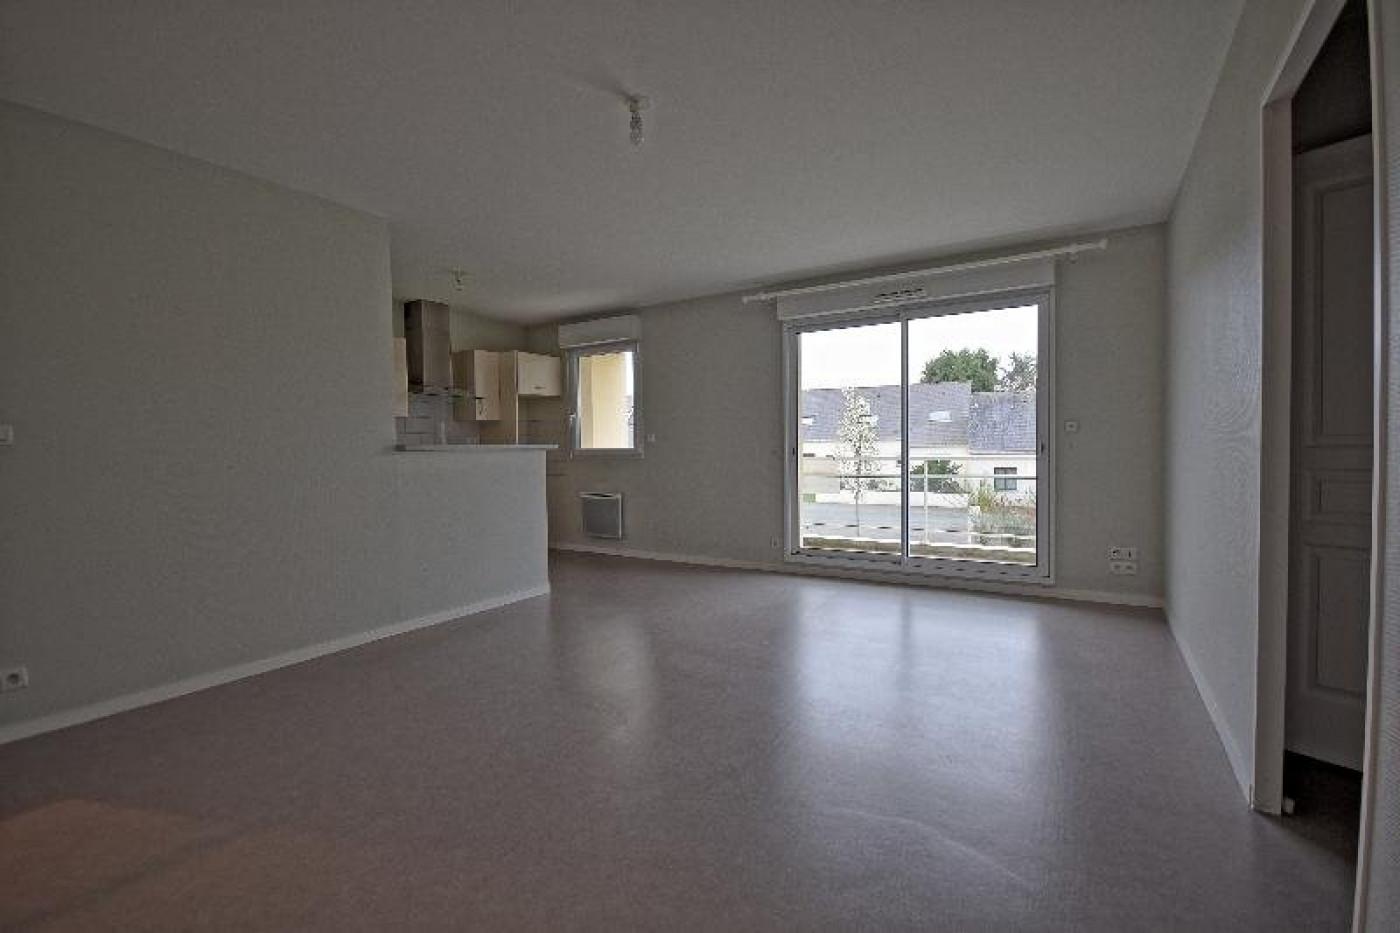 A vendre Chateaubriant 44015121 Agence porte neuve immobilier